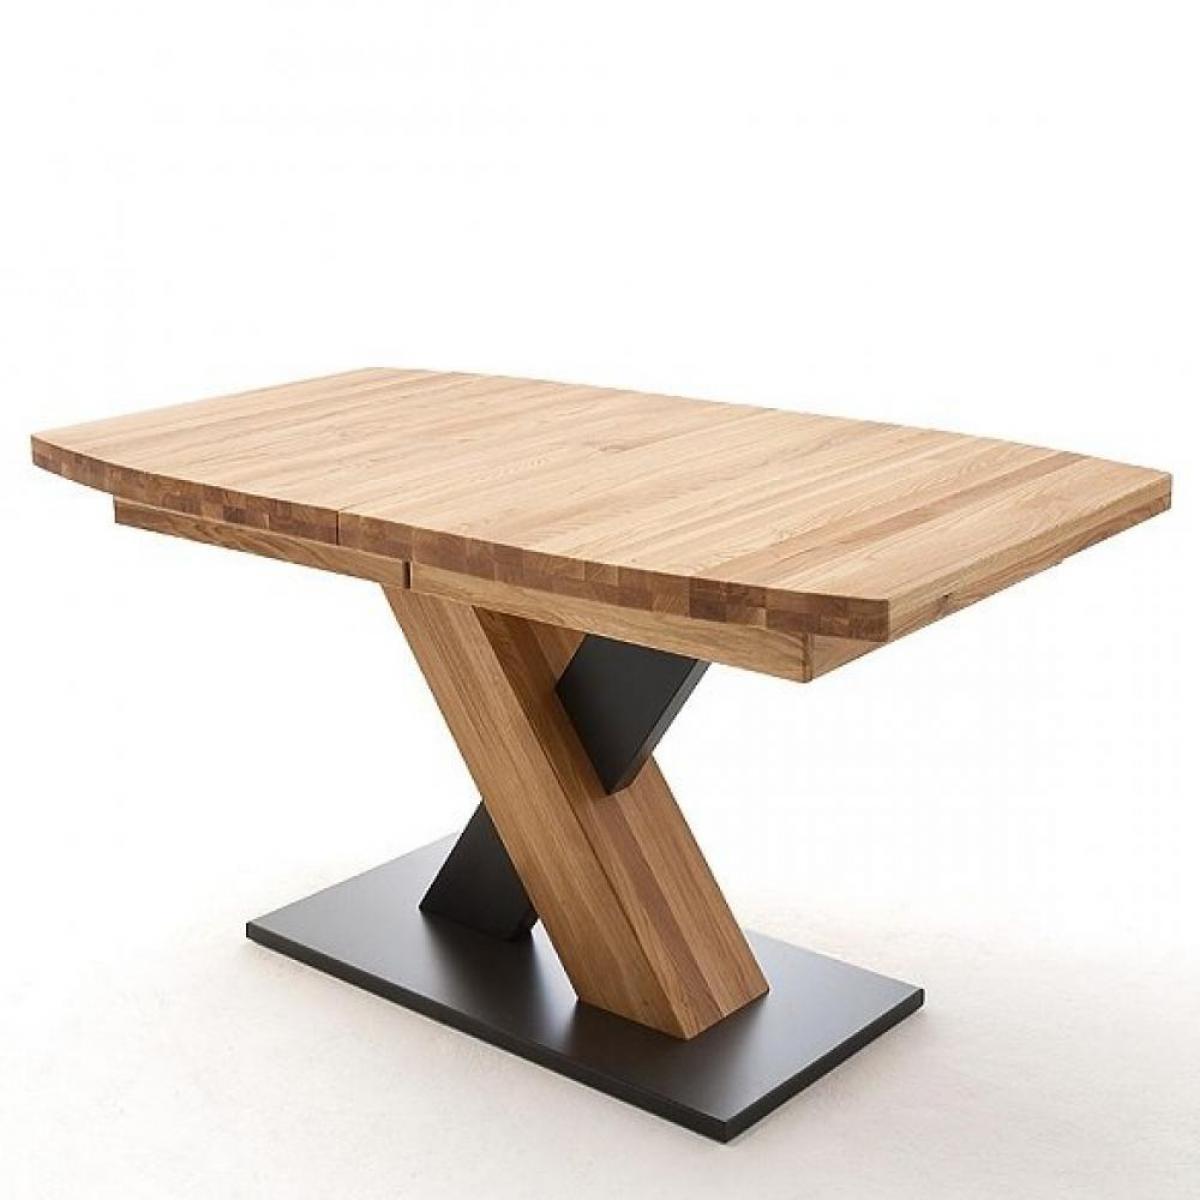 Inside 75 Table extensible MELERO 180 x 100 cm chêne sauvage huilé massif